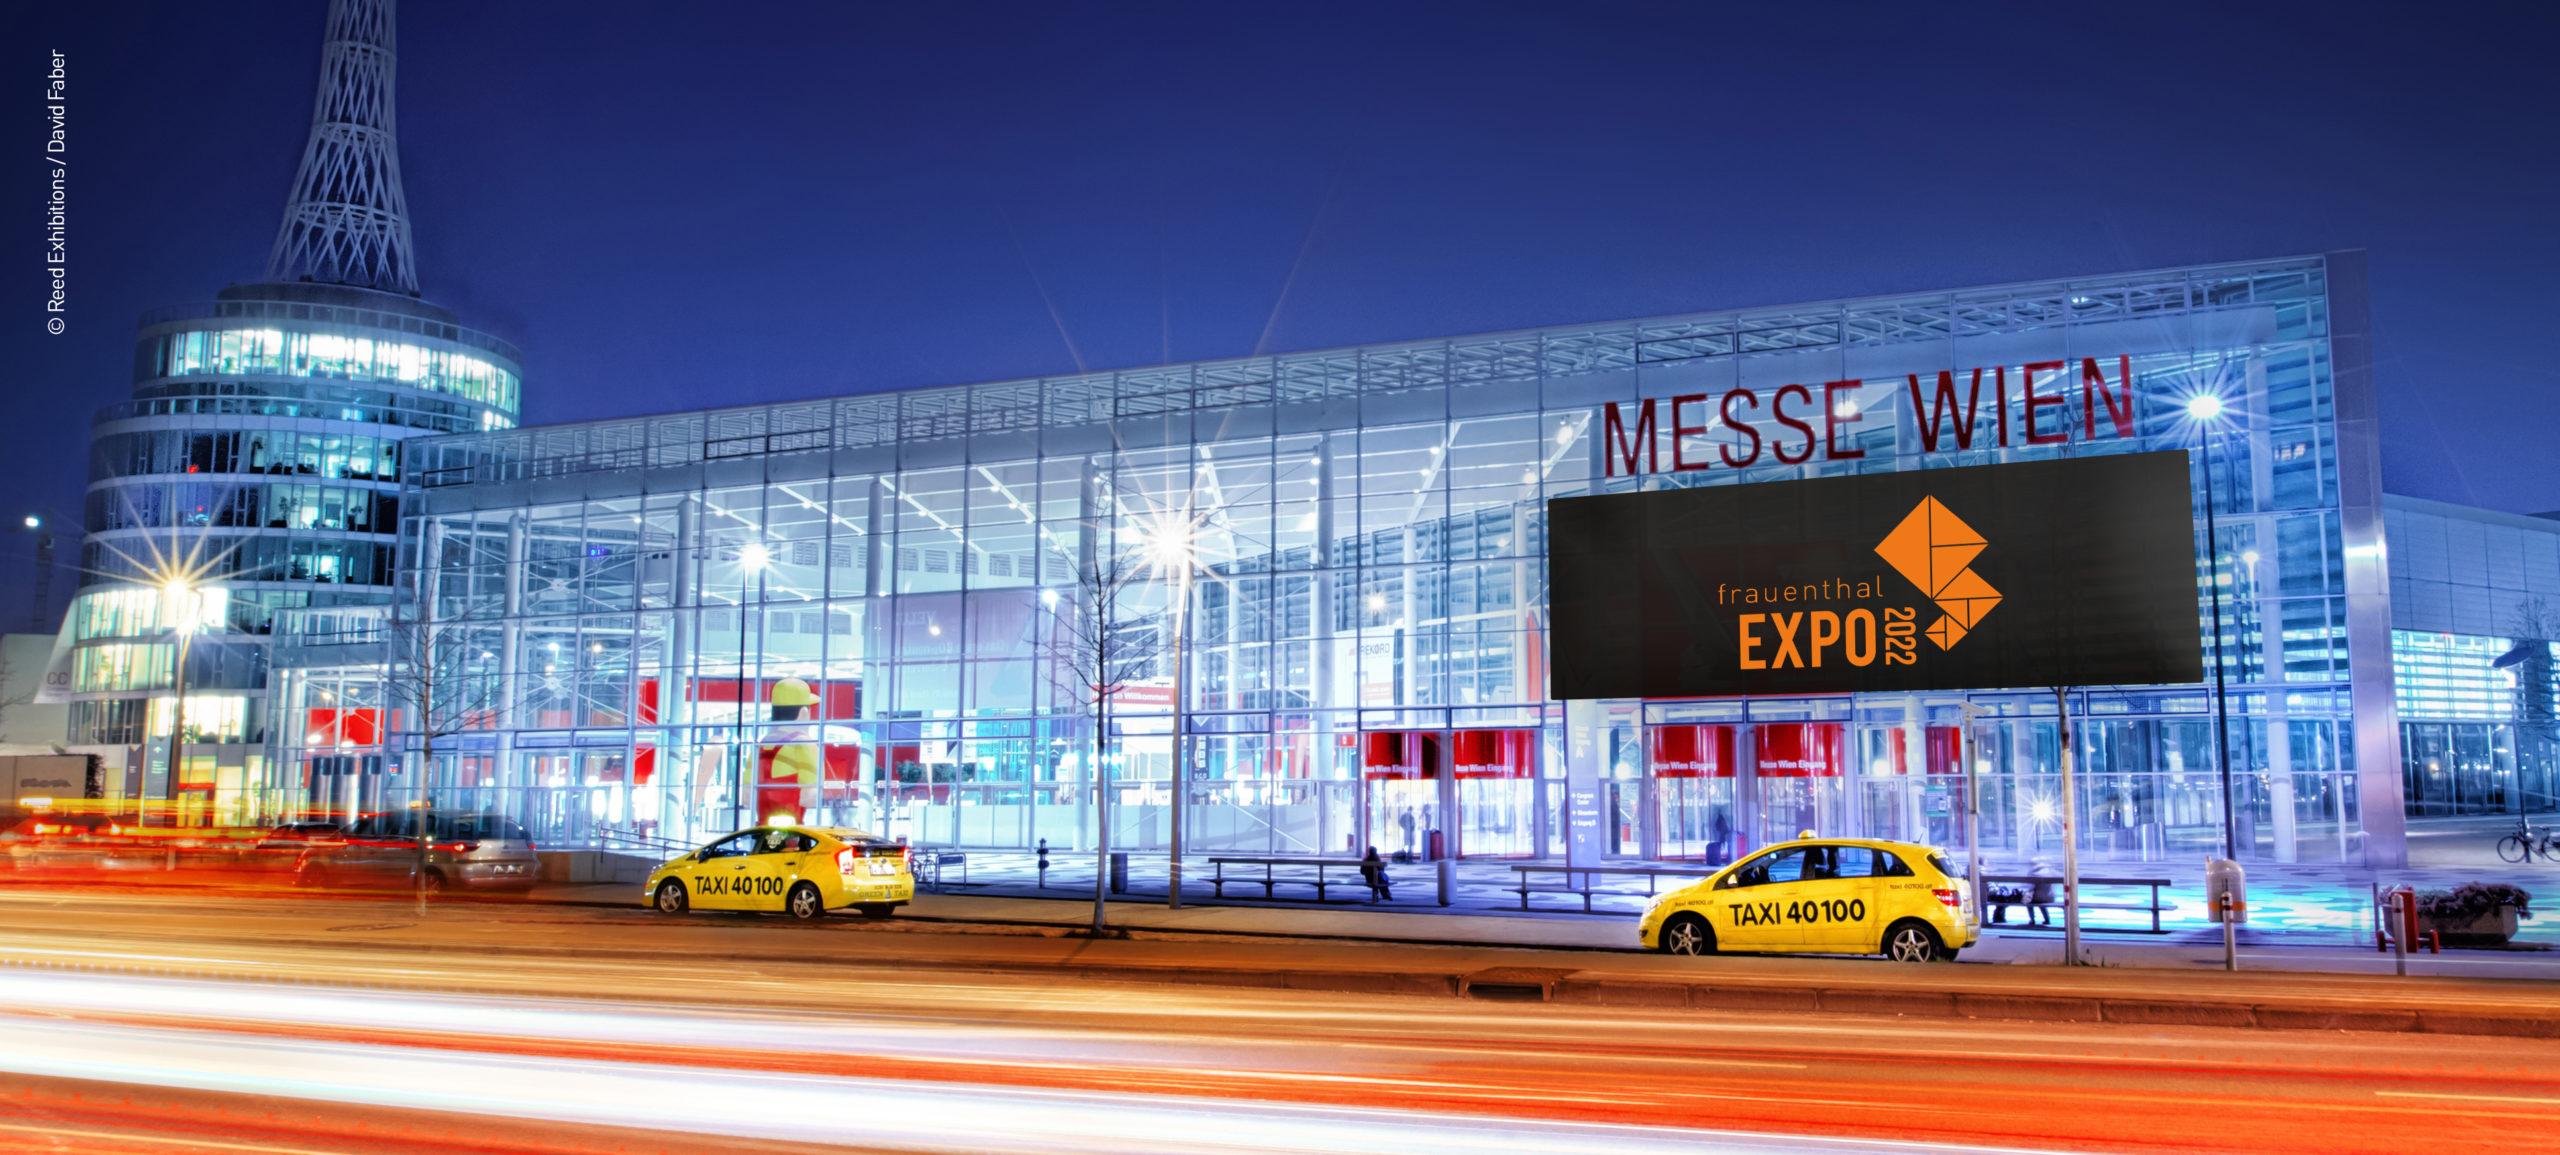 Messe Wien (Foto: Reed Exhibitions/David Faber)